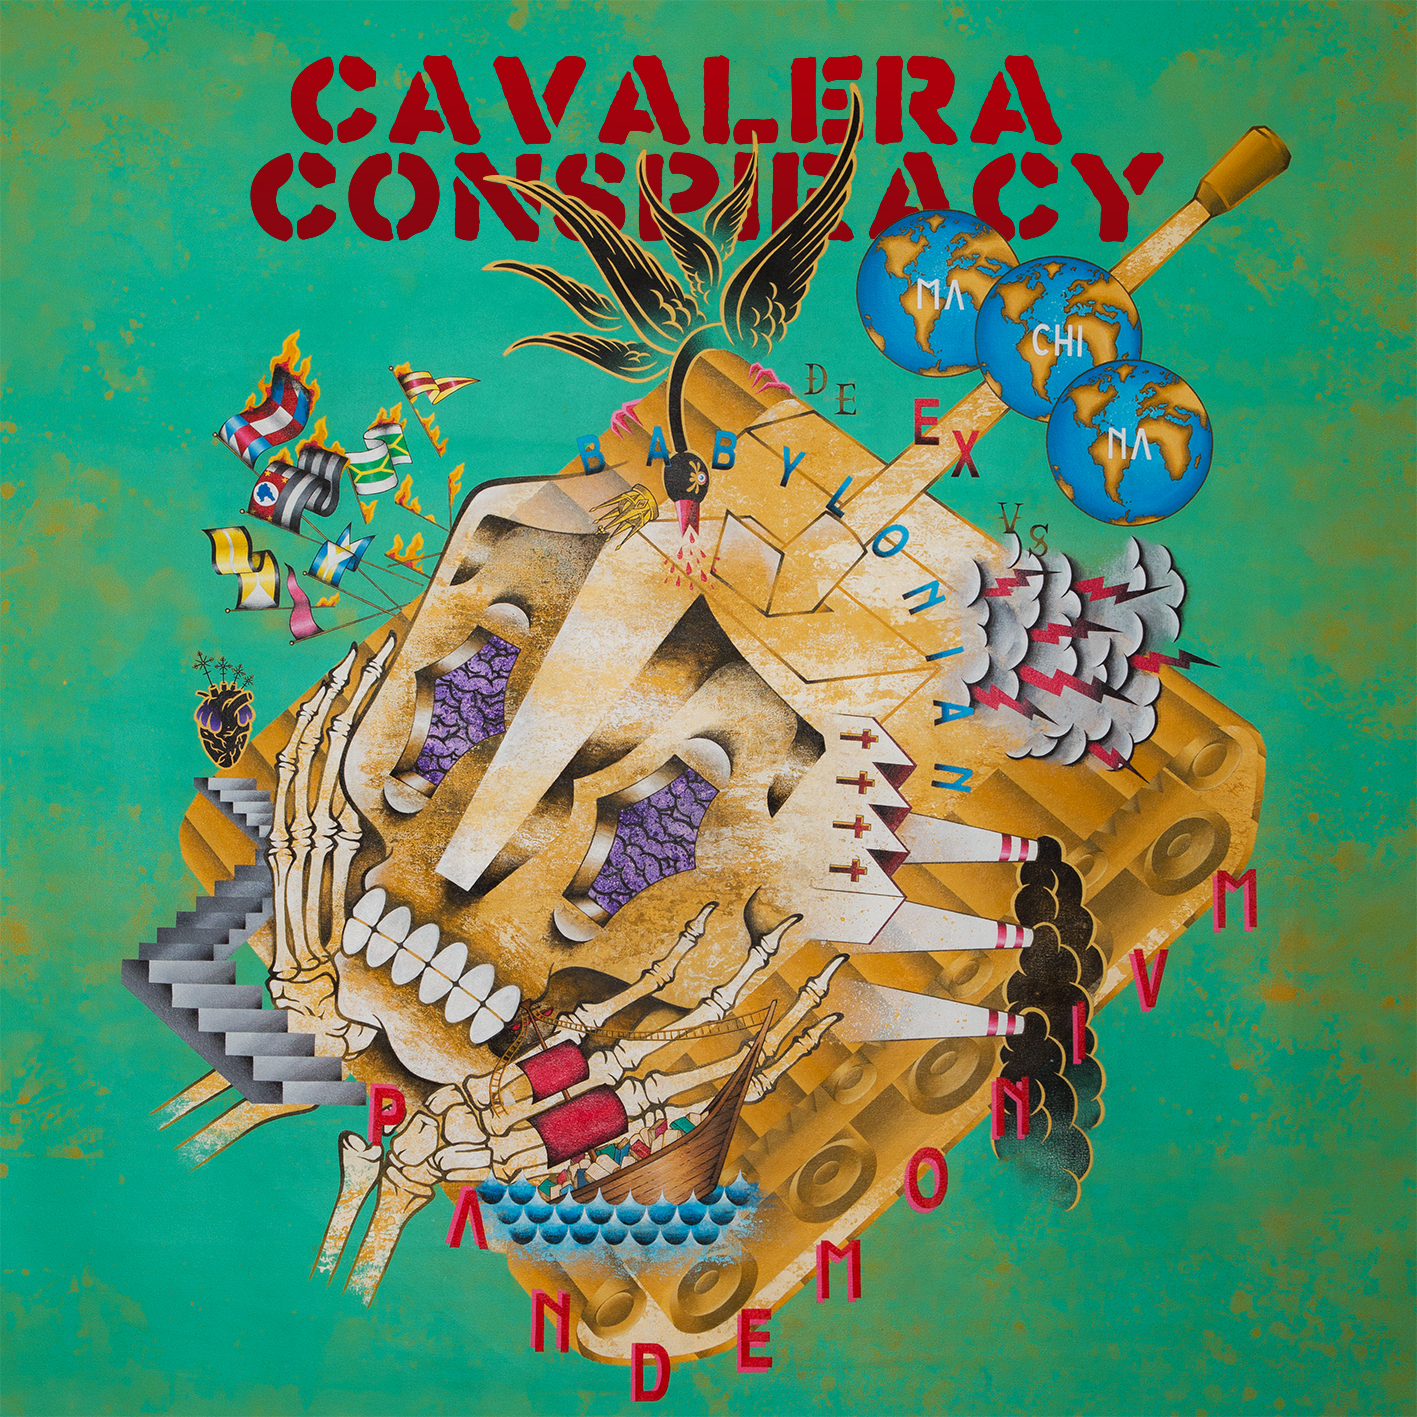 Cavalera Conspiracy – Pandemonium Review